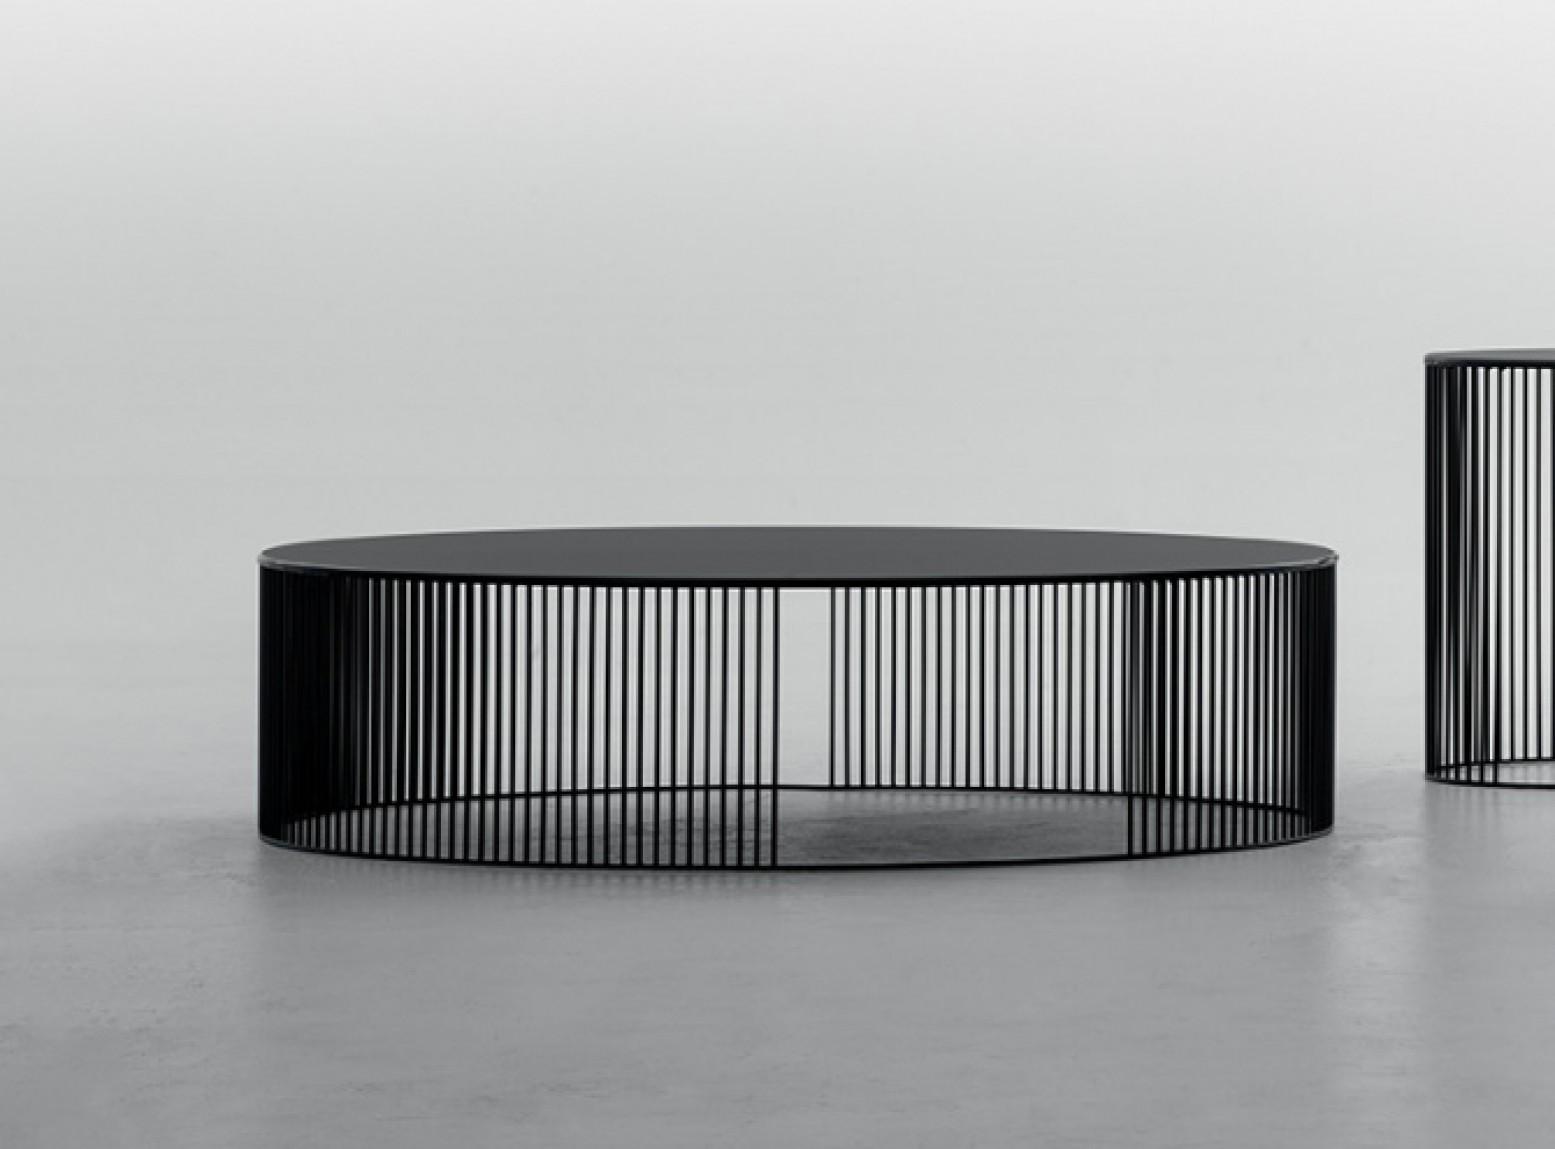 andra large coffee table matt black metal base acid etched black glass top